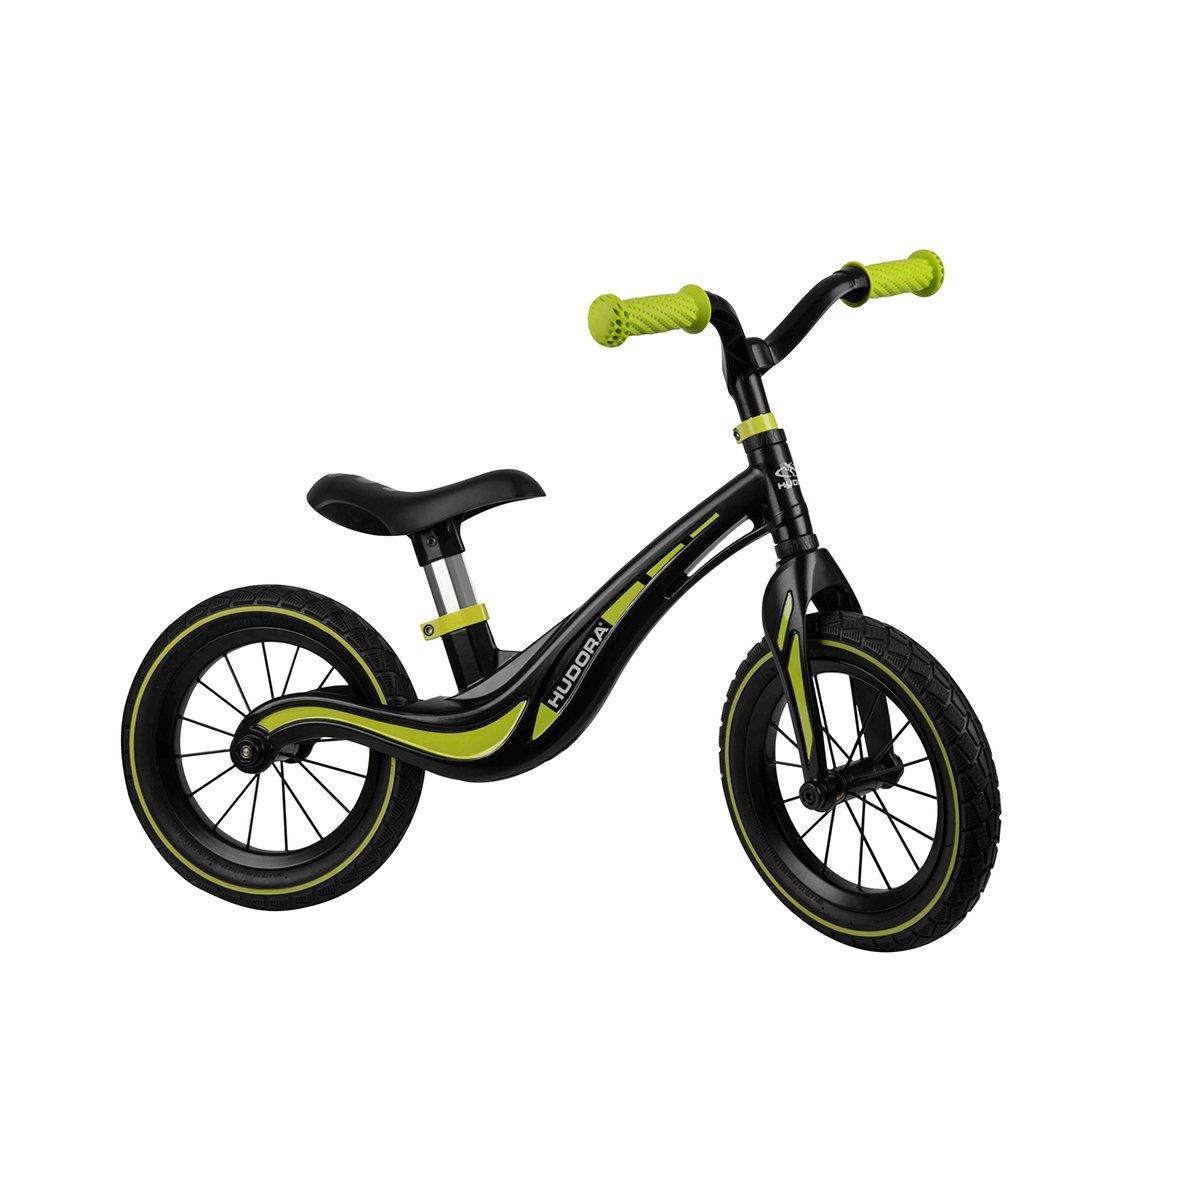 Bicicleta fara pedale, din aliaj de Magneziu Hudora Eco, 12 Inch